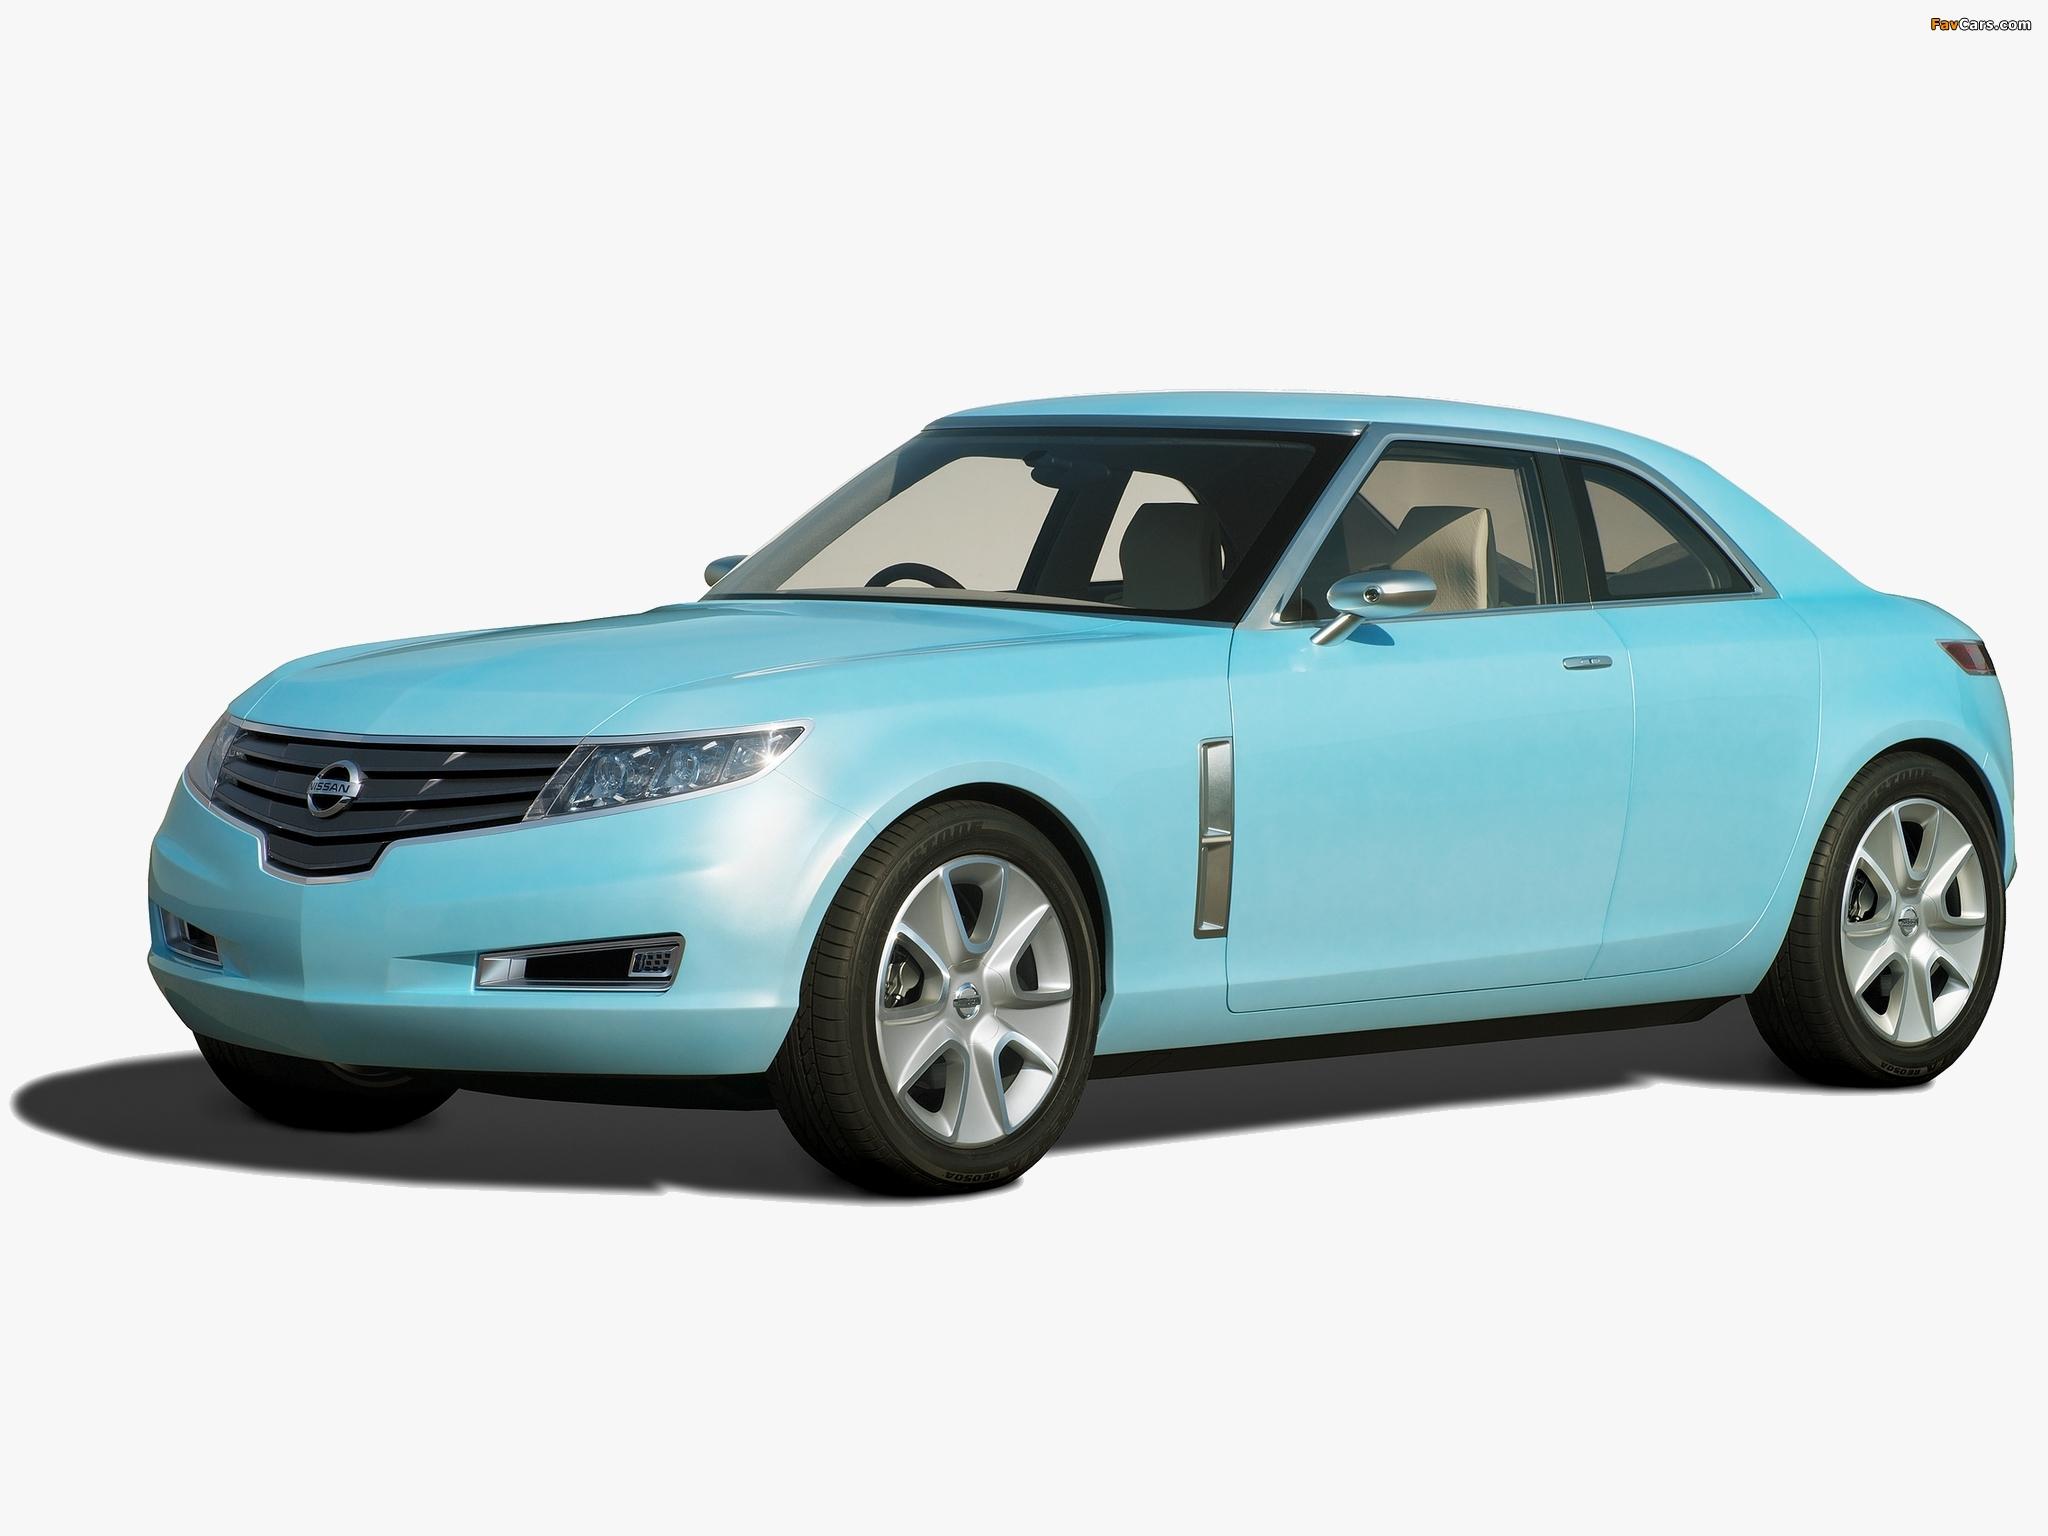 Nissan Foria Concept 2005 images (2048 x 1536)